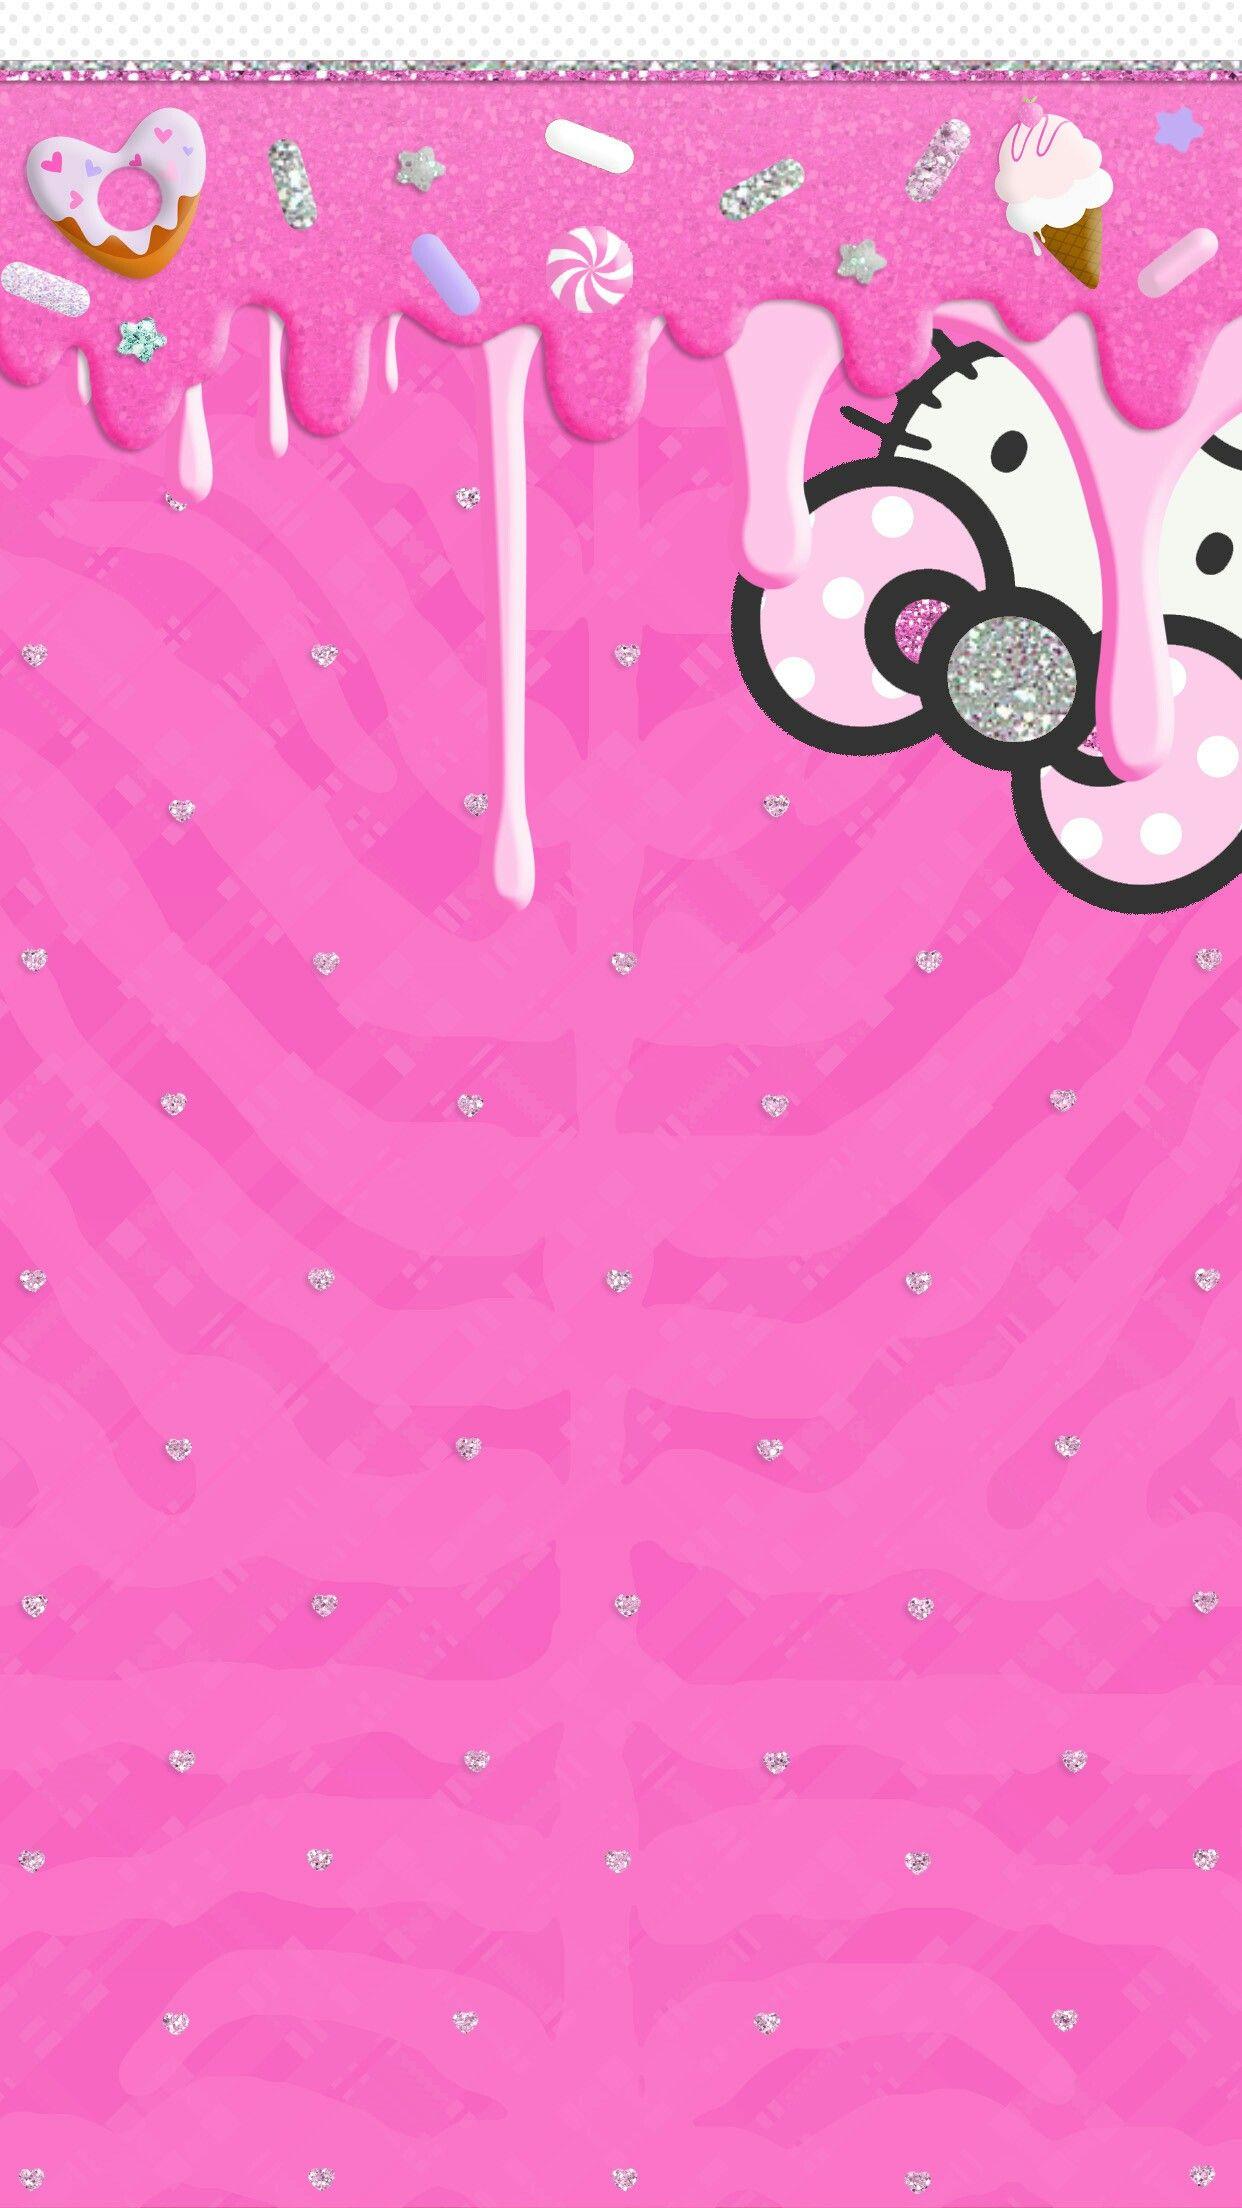 Simple Wallpaper Hello Kitty Glitter - 4682aa59c4ce949b02a9d23b8d413066  Best Photo Reference_757279.jpg